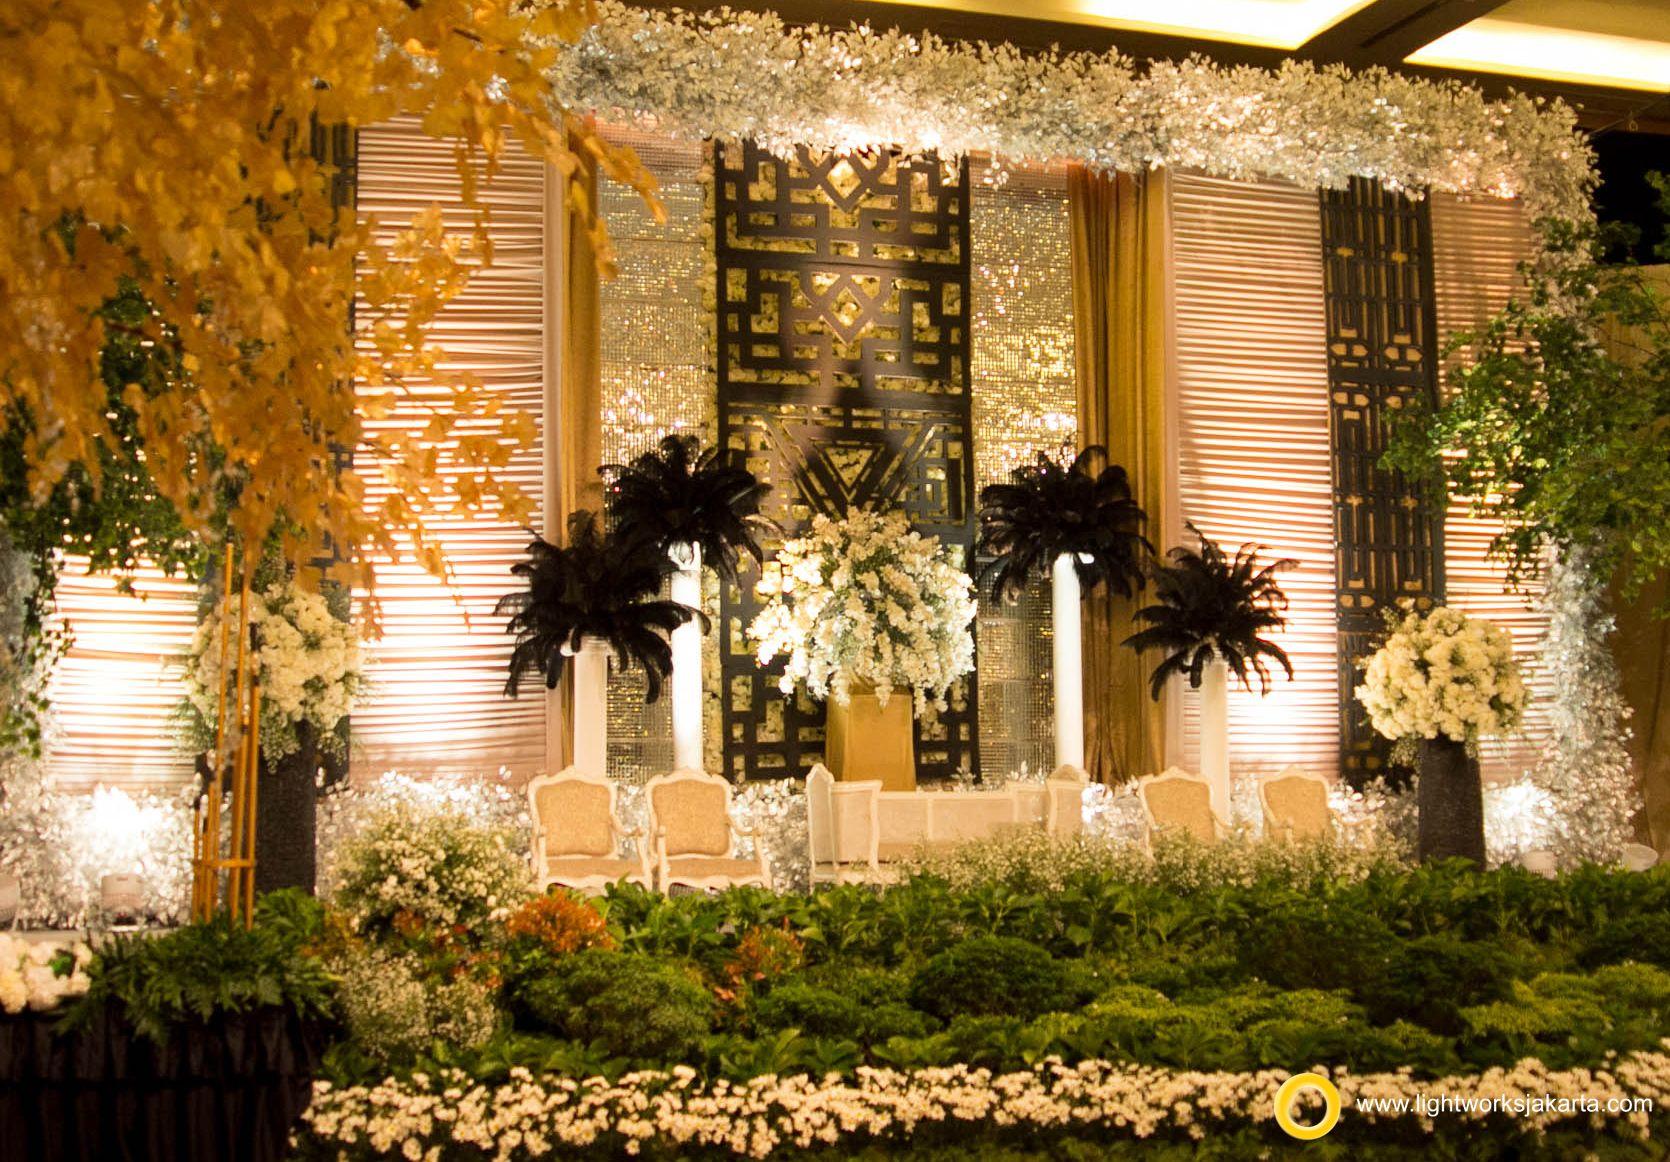 Oliver and Stella's Wedding Reception; Venue at Pullman